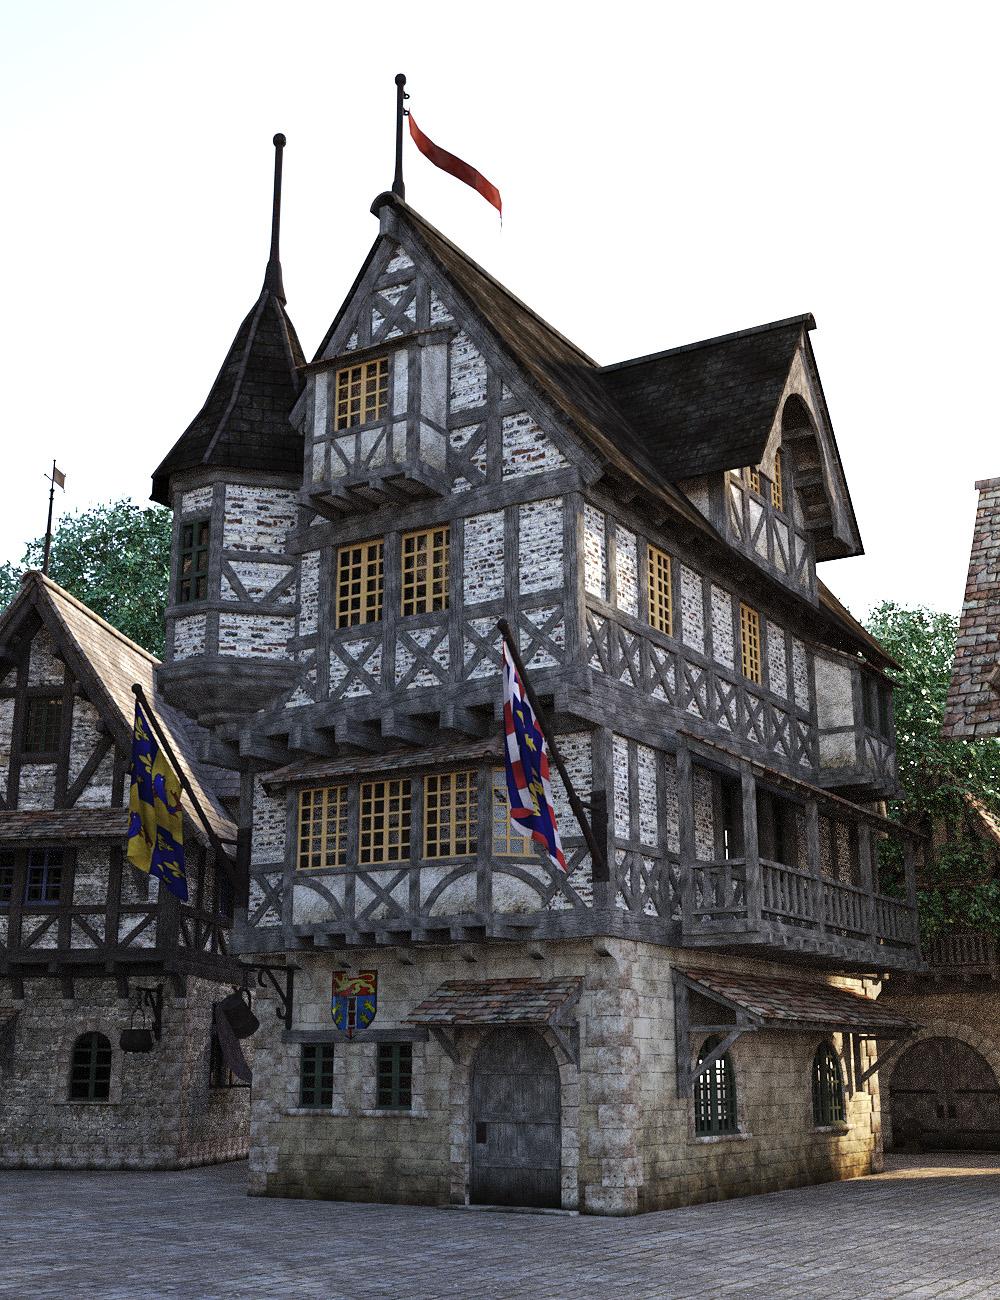 Modular Medieval Village by: Faveral, 3D Models by Daz 3D